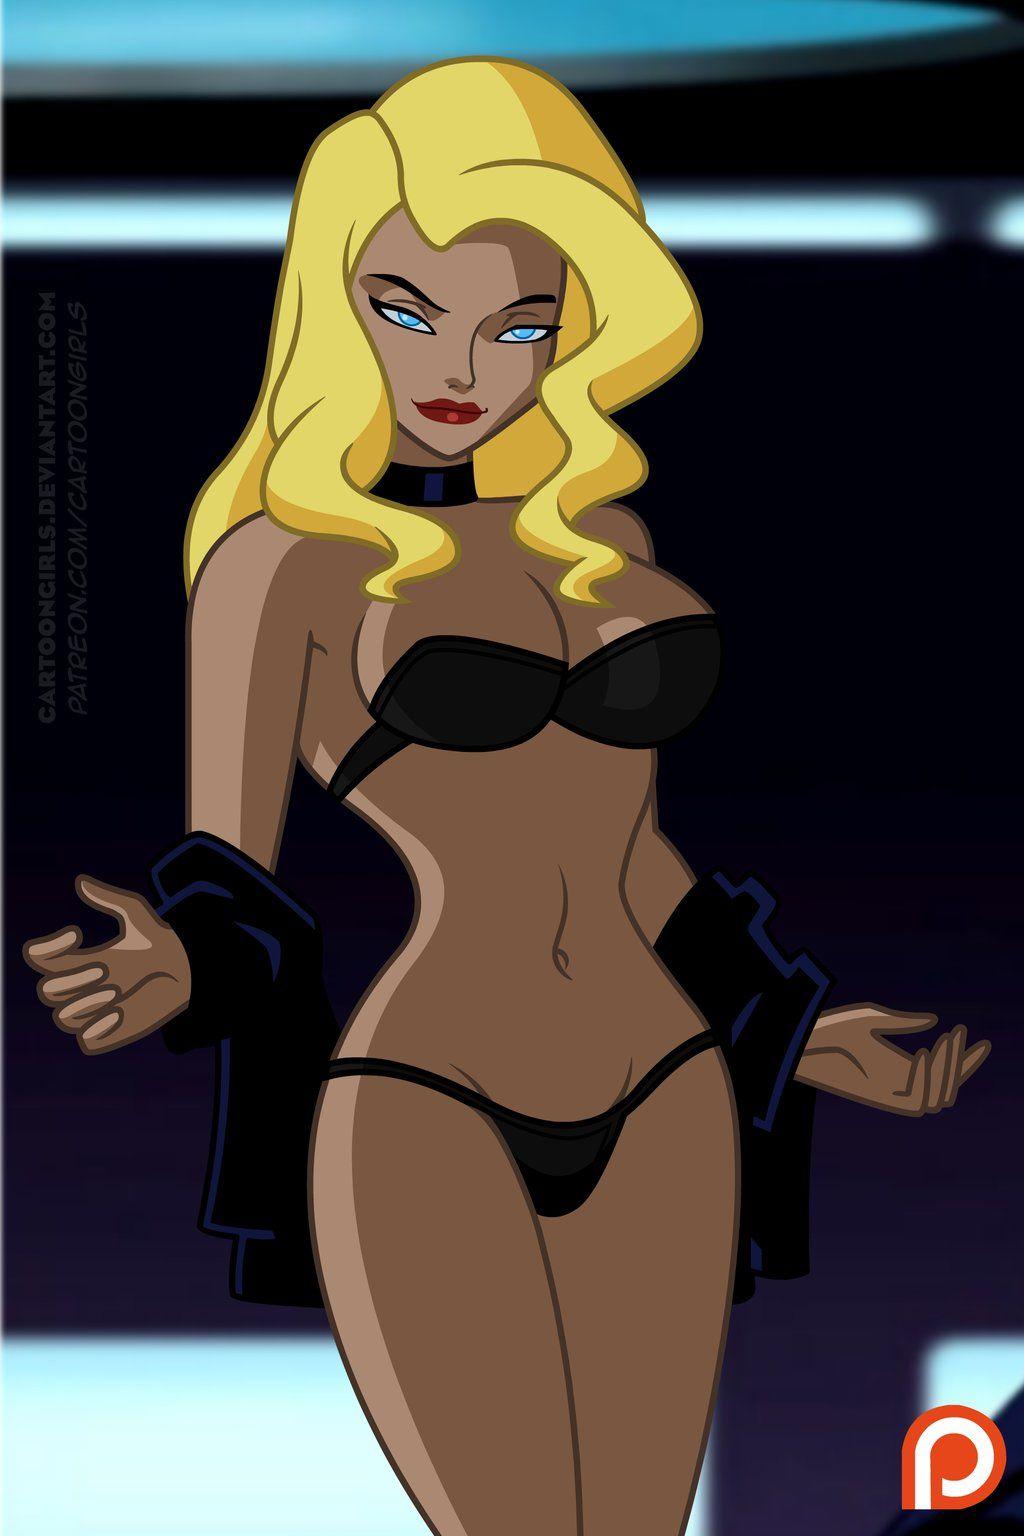 League woman porno wonder justice hentai